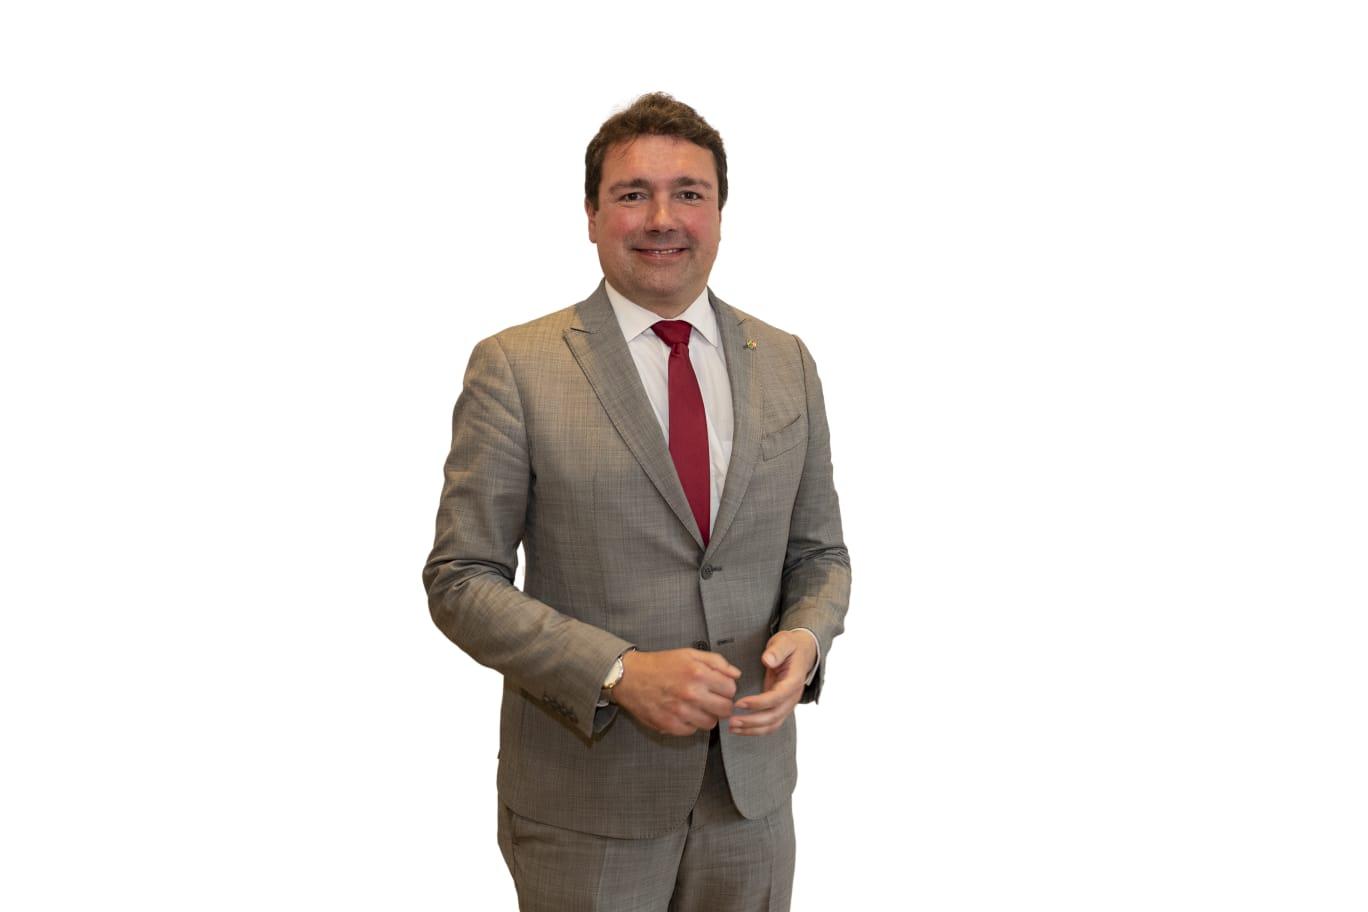 Christian Mangen